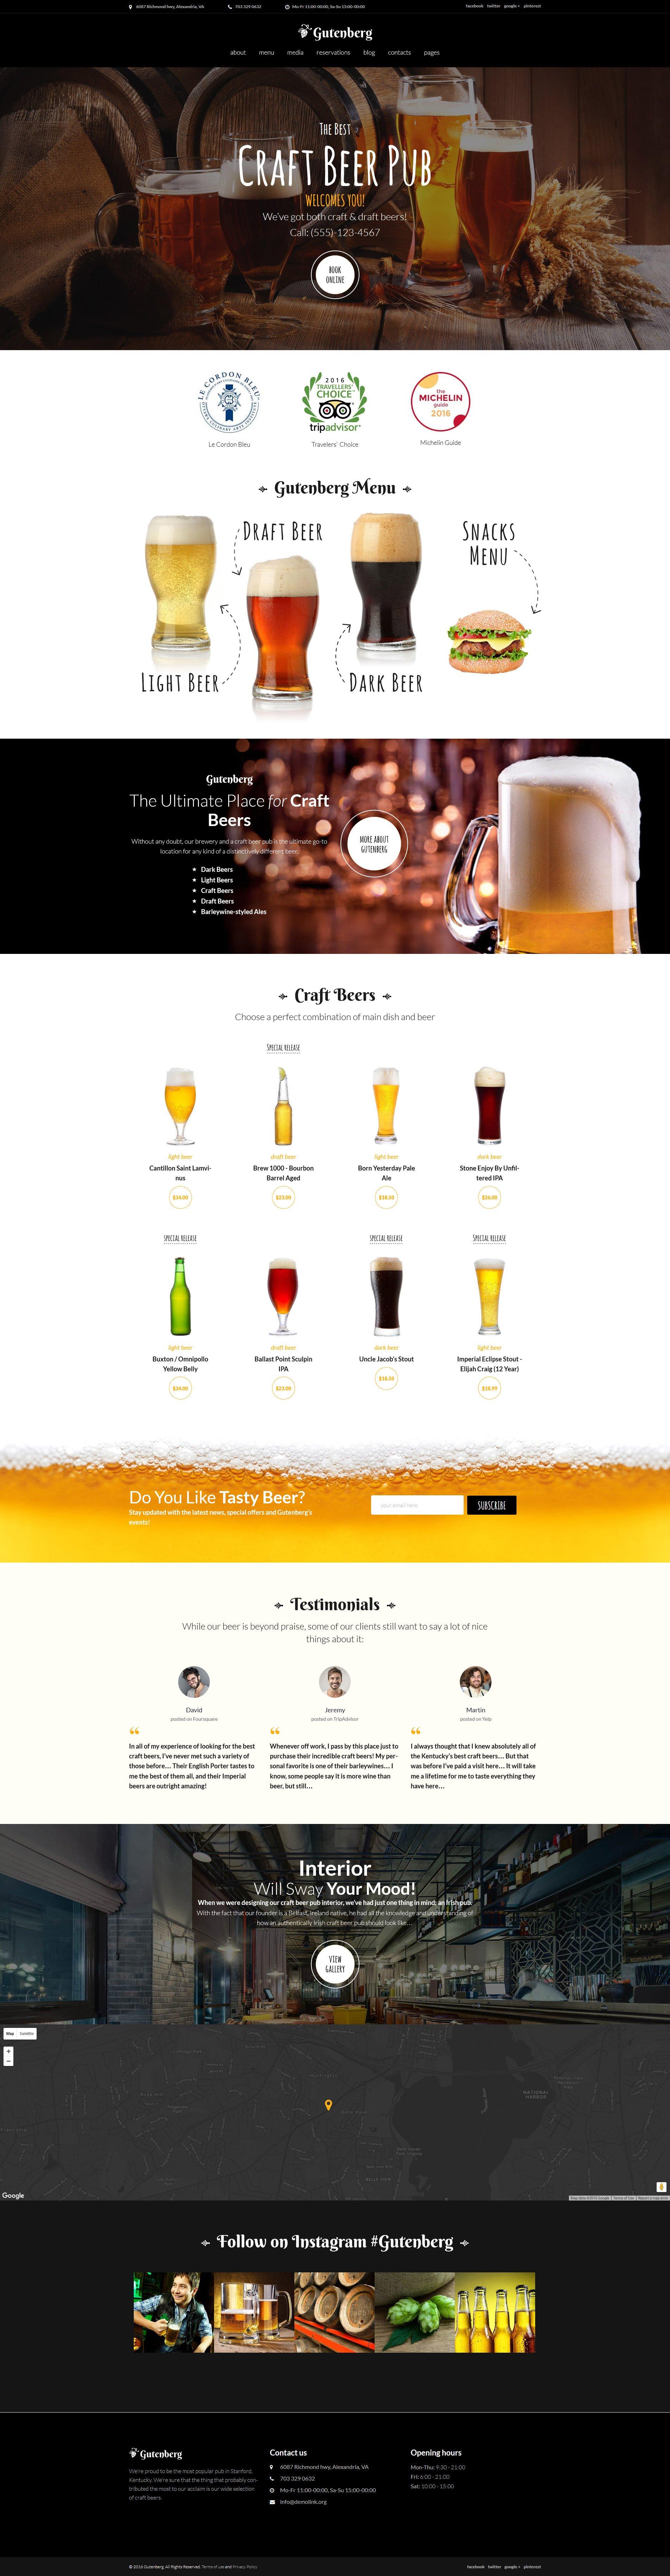 """GutenBerg - Pub et Brasserie"" thème WordPress adaptatif #59005"